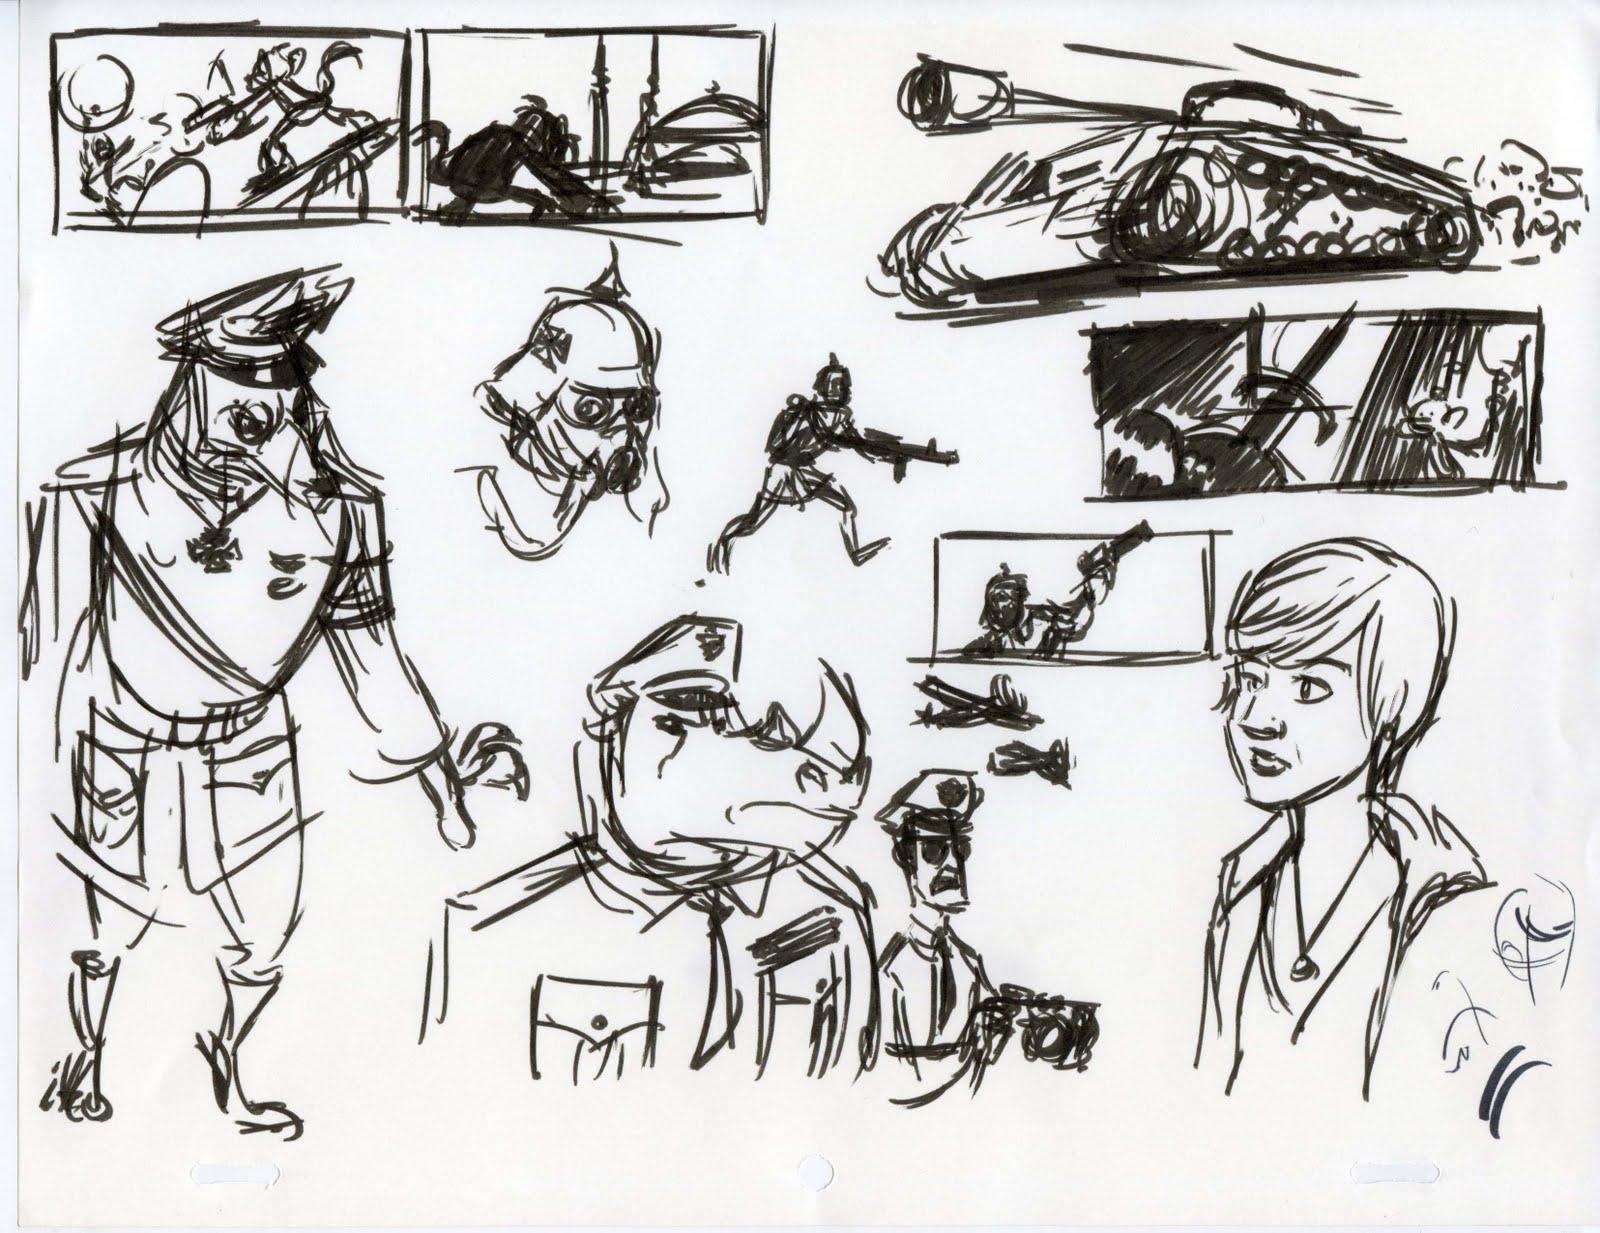 scotland u0027s art blog of monkeys and legioniaries sketches